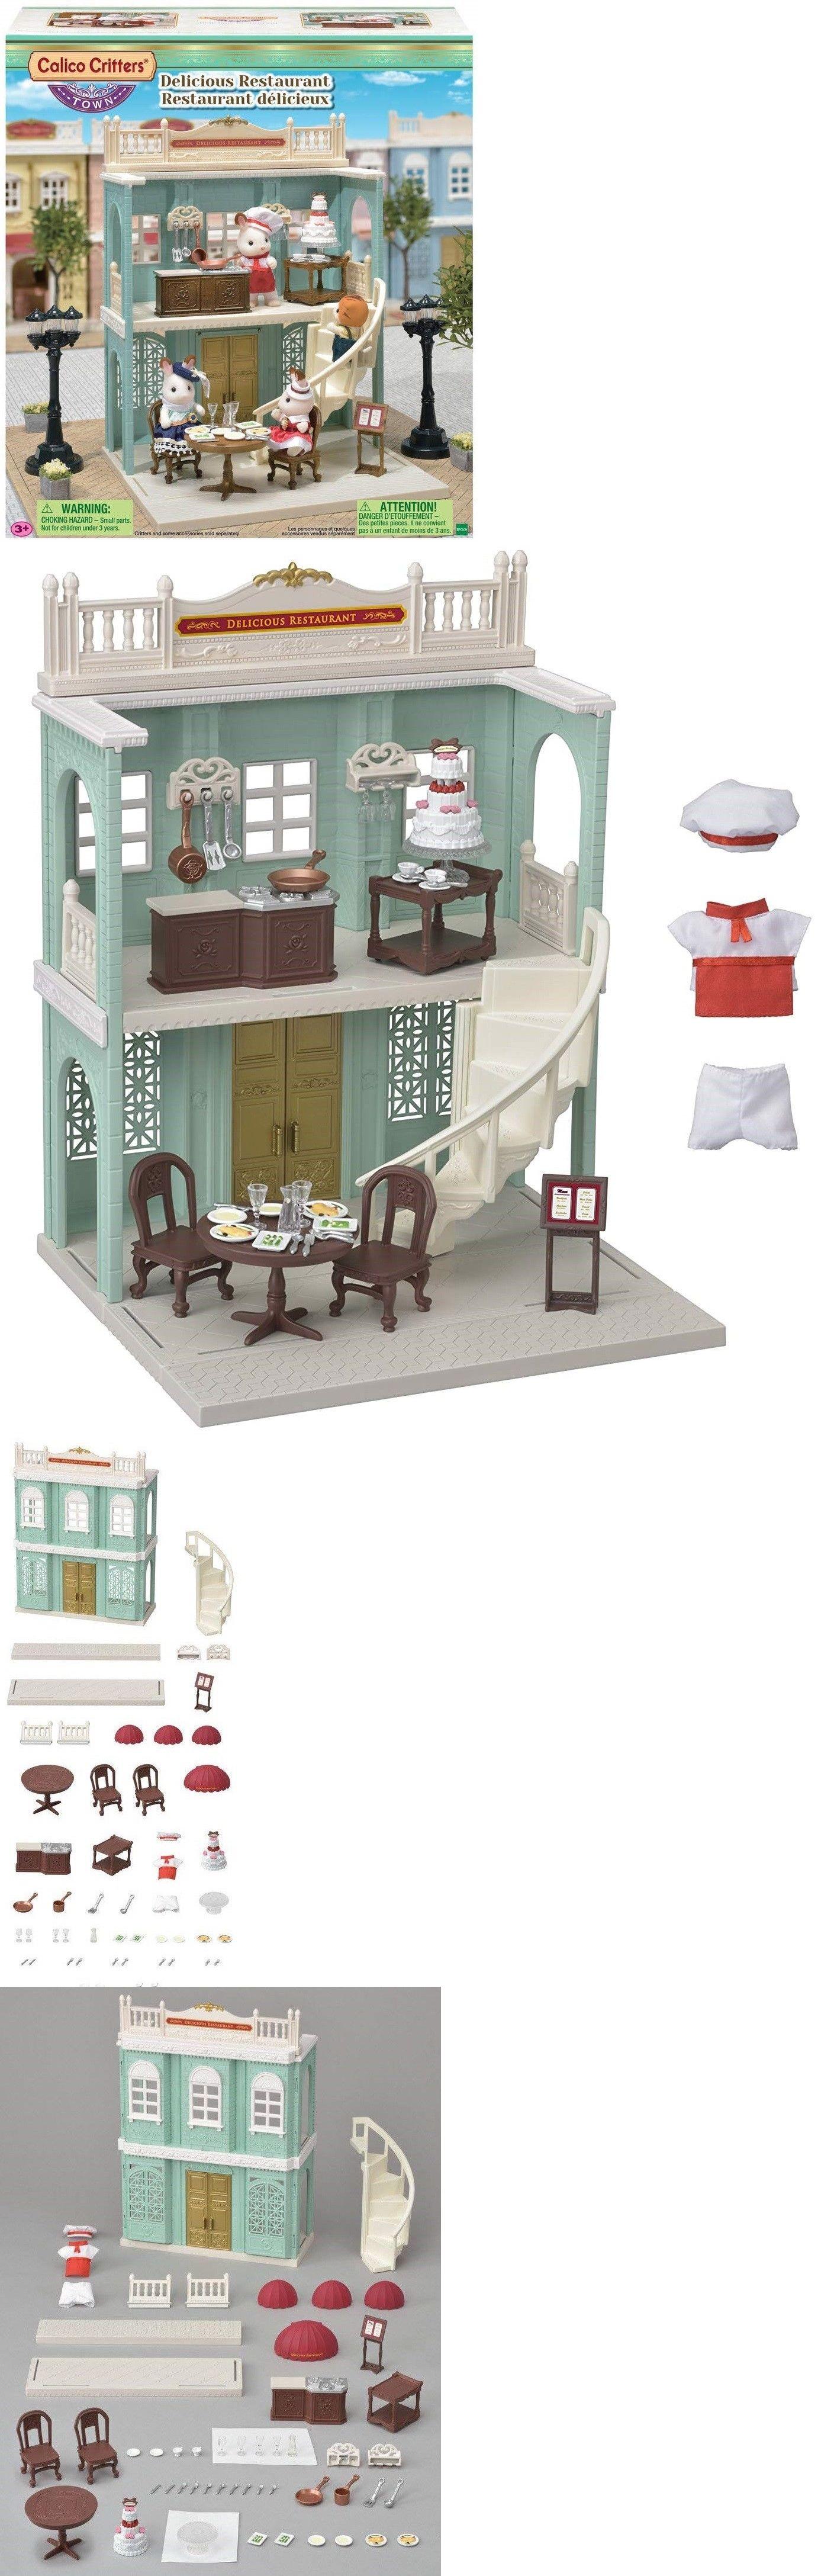 Playmobil 19854: Calico Critters Delicious Restaurant Building Set ...